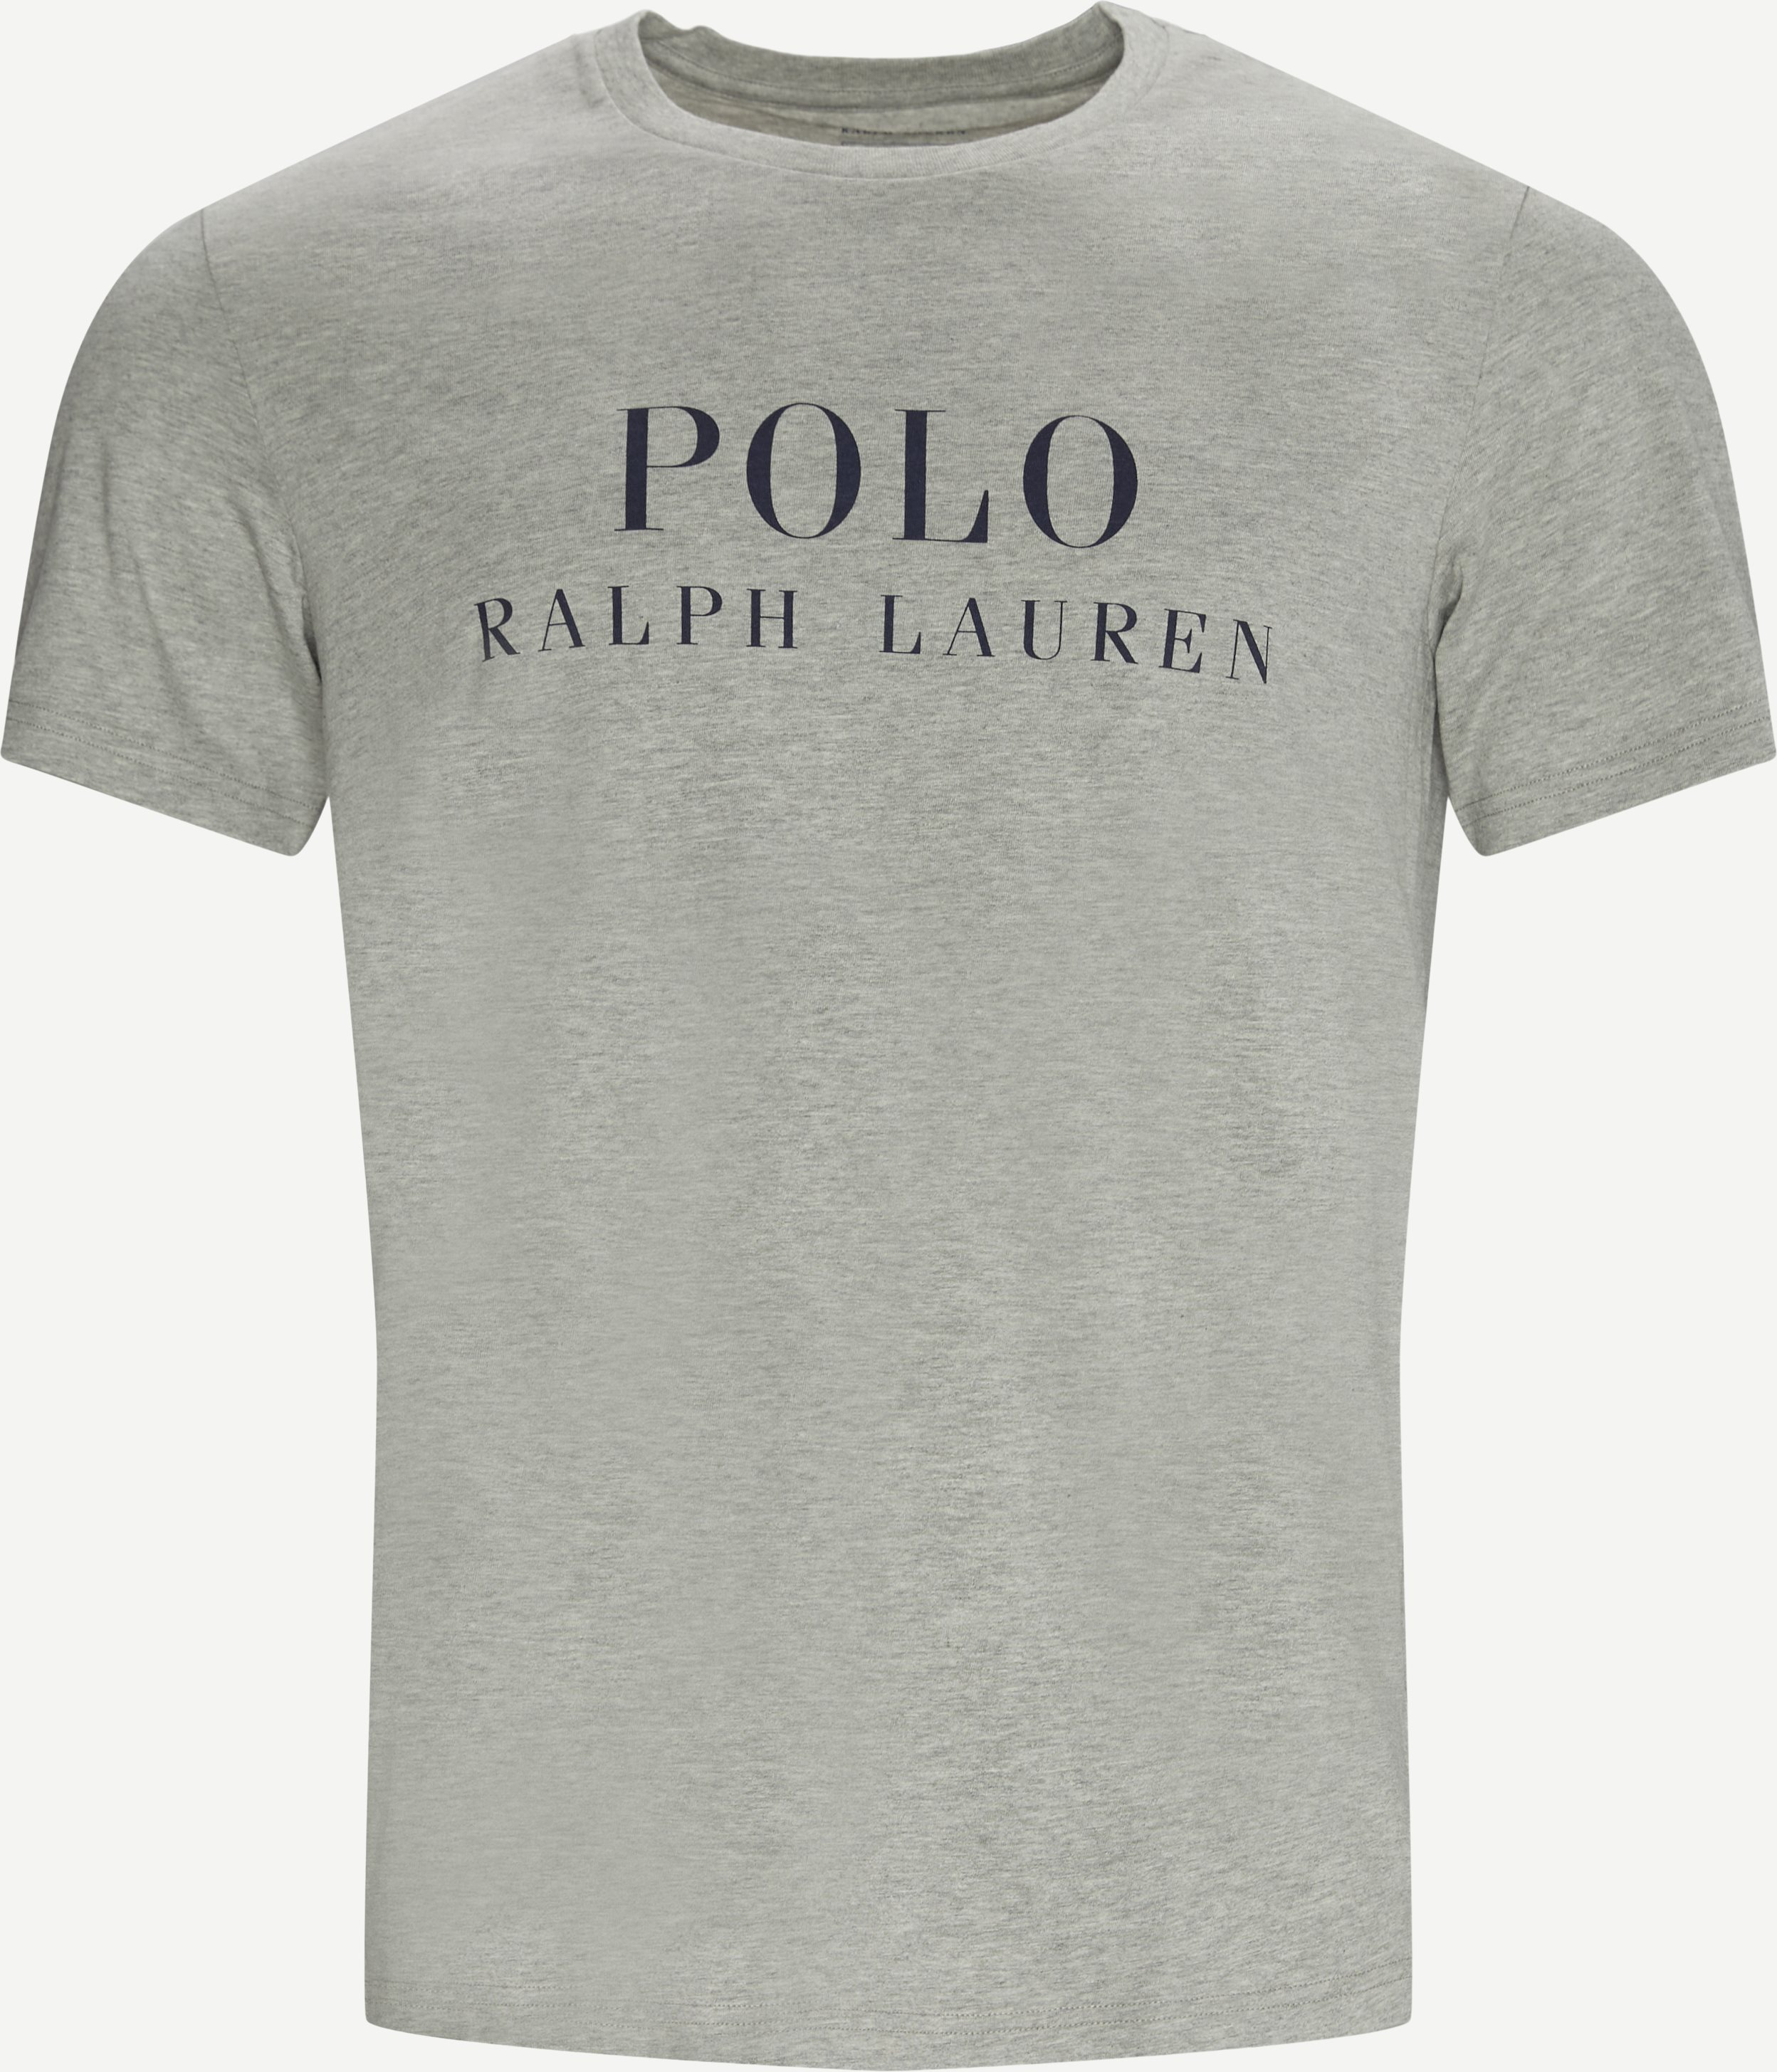 T-shirts - Regular fit - Grey